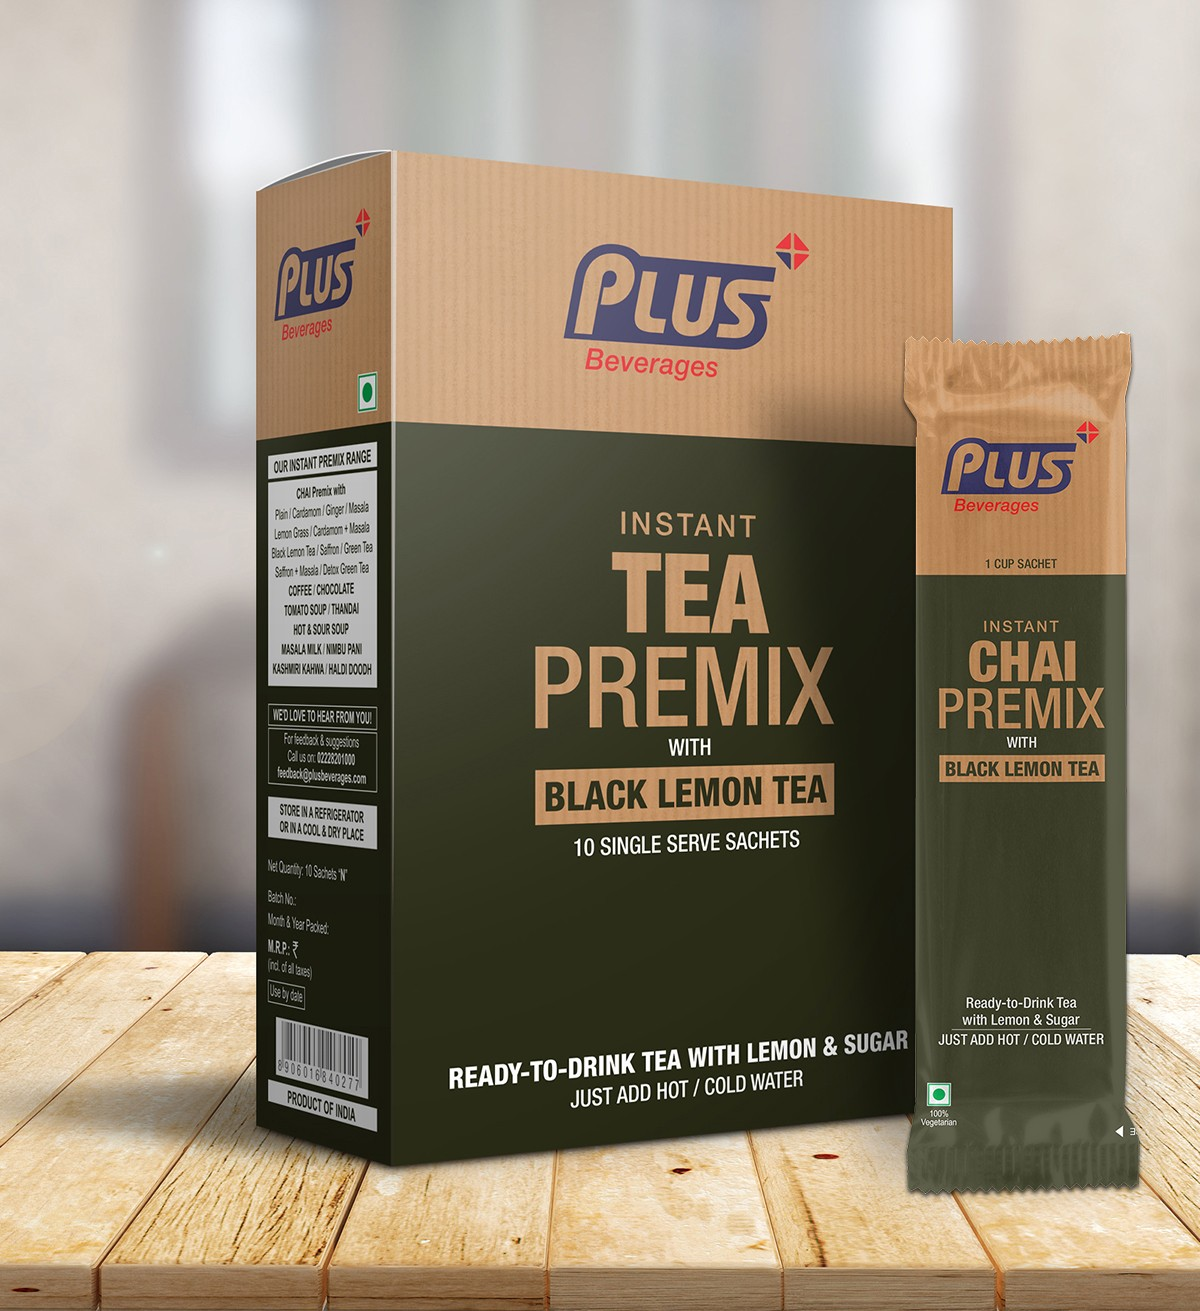 Get Instant Black Lemon Tea Premix at best price - Free Shipping | Plus Beverages